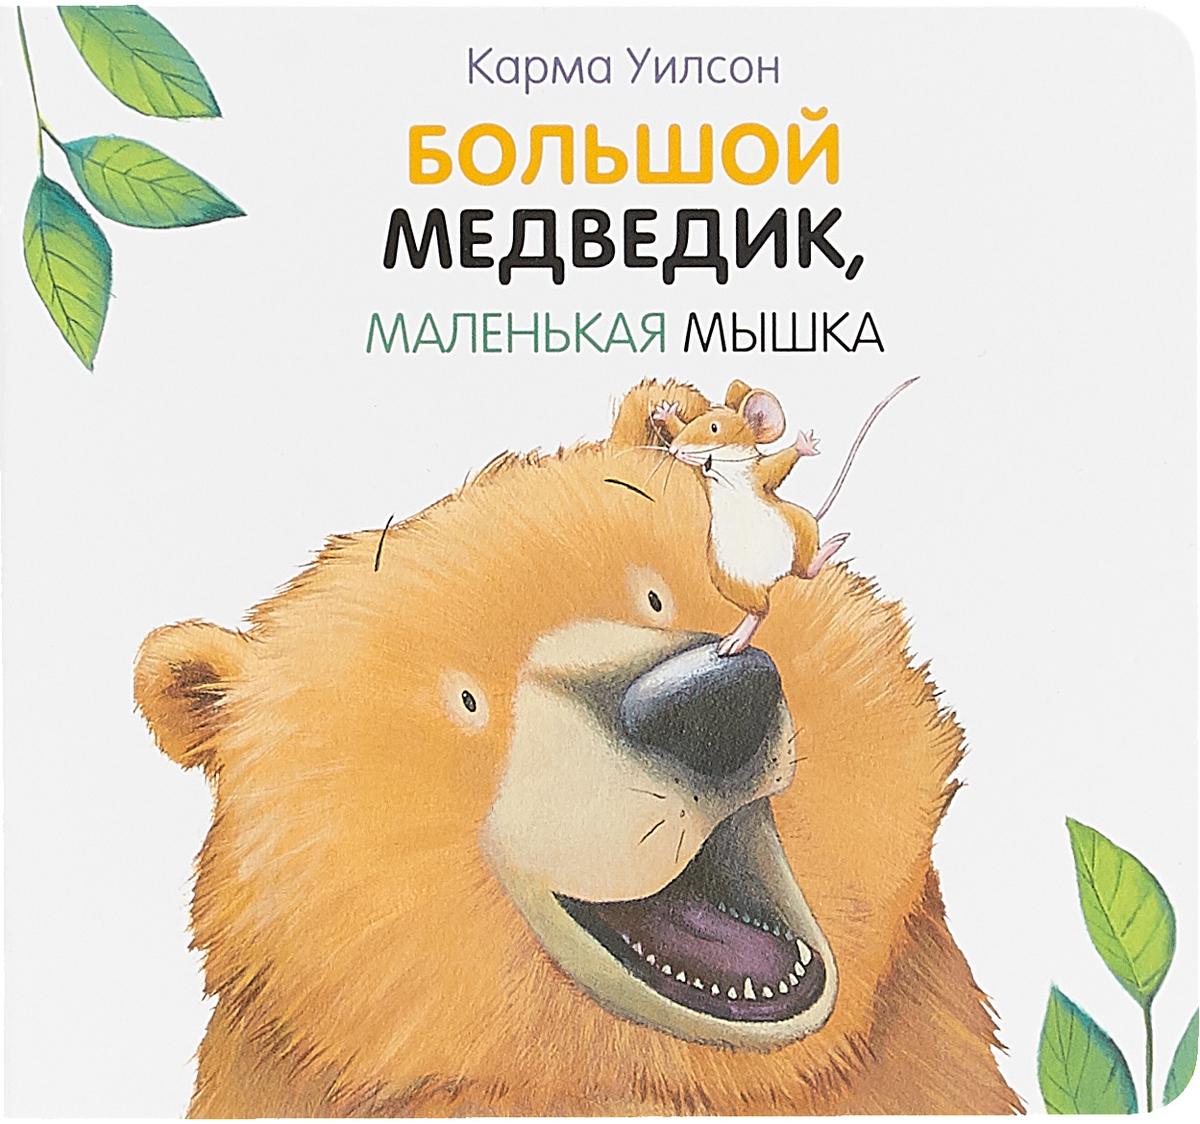 Карма Уилсон Большой медведик, маленькая мышка